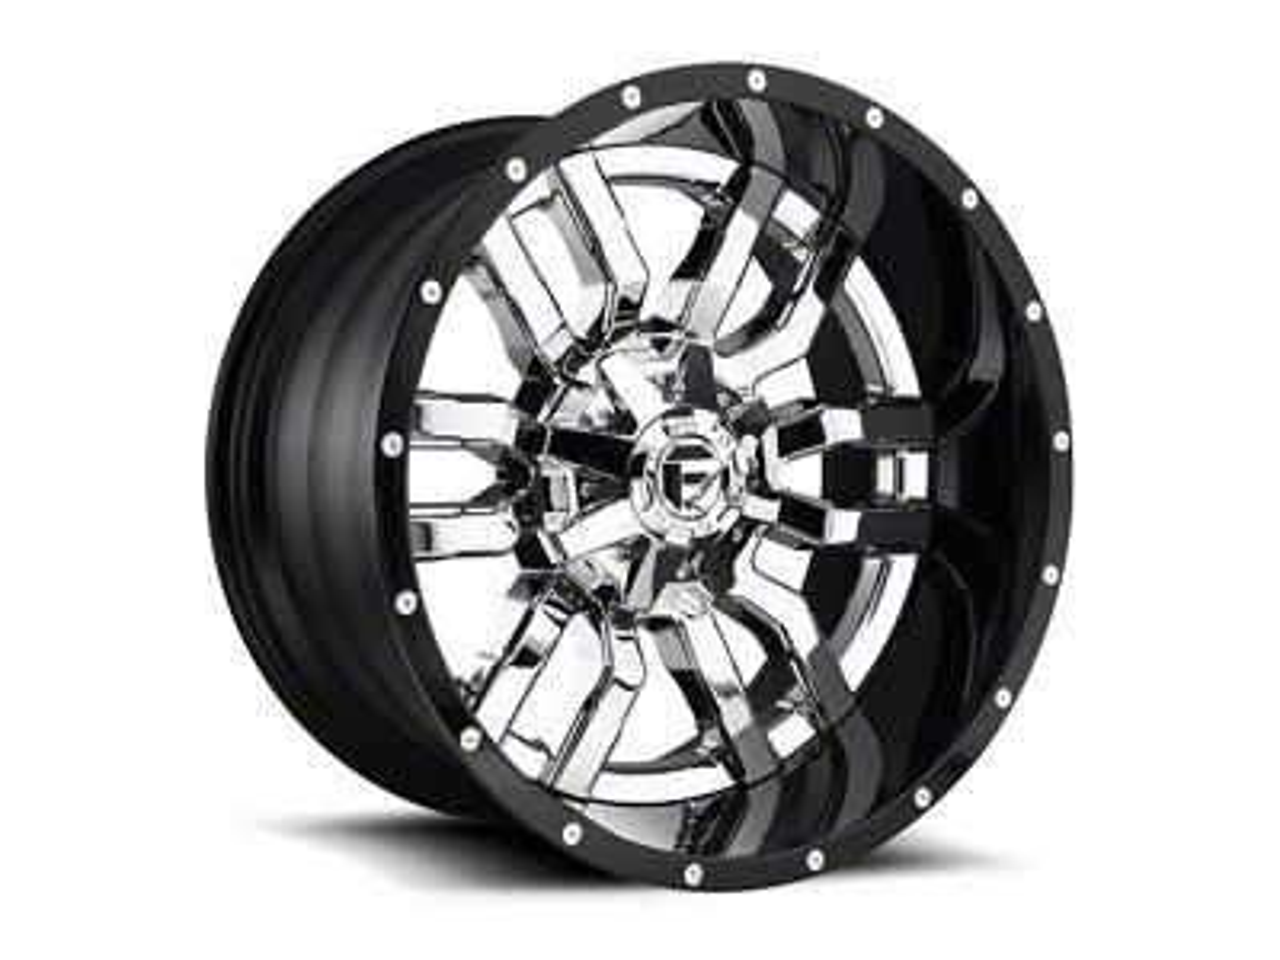 Fuel Wheels Sledge Chrome 6-Lug Wheel - 22x10 (07-18 Sierra 1500)